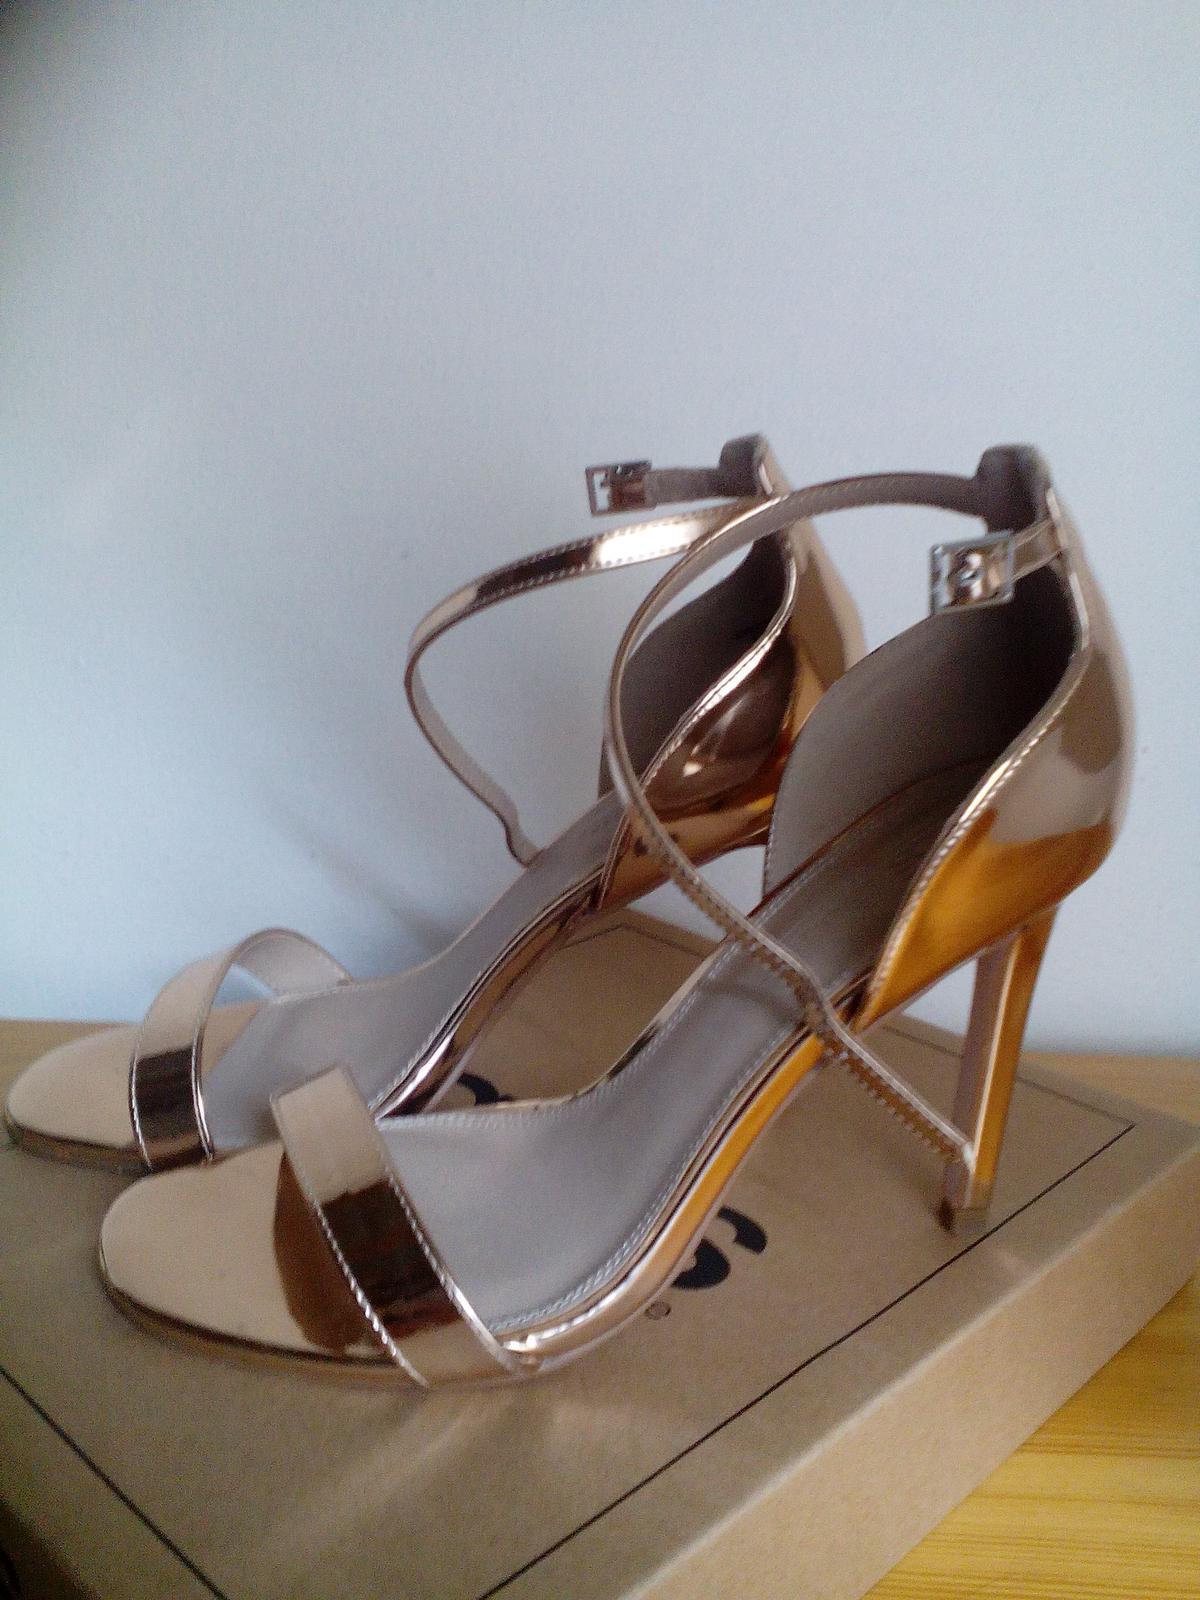 4daf1d1e6d47 Spoločenské sandále ružové zlato